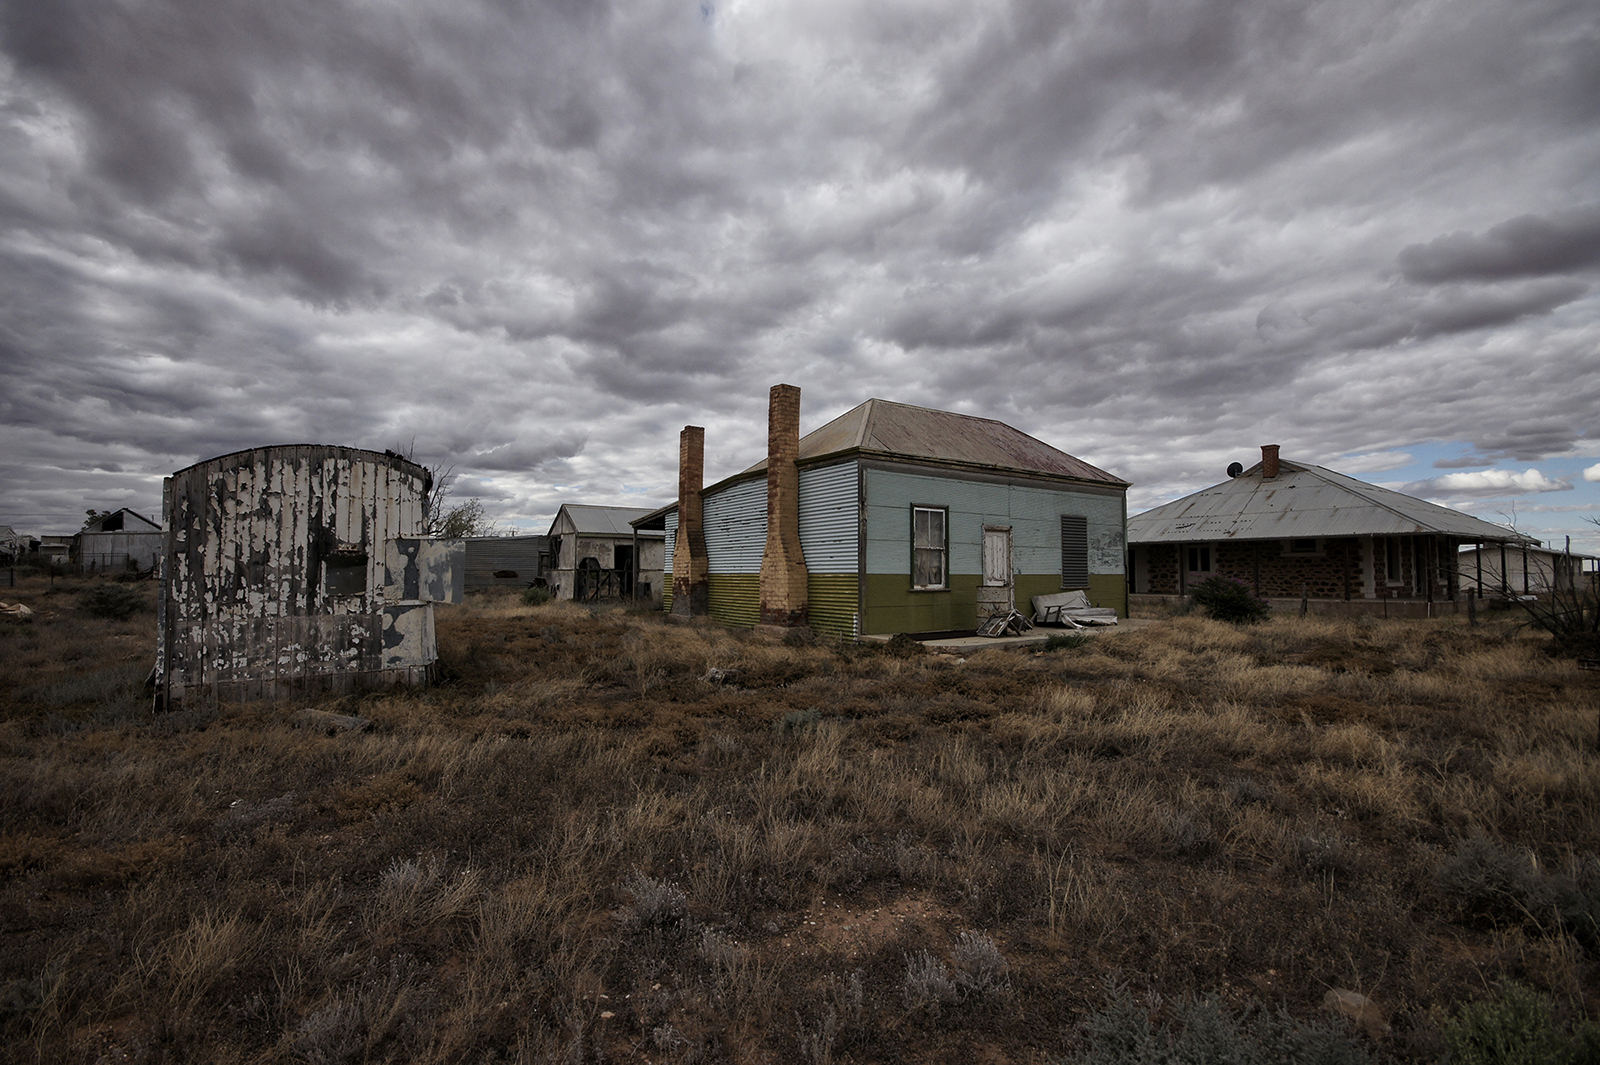 Kieran Rae Borderwalk Australia Outback Abandoned Derelict